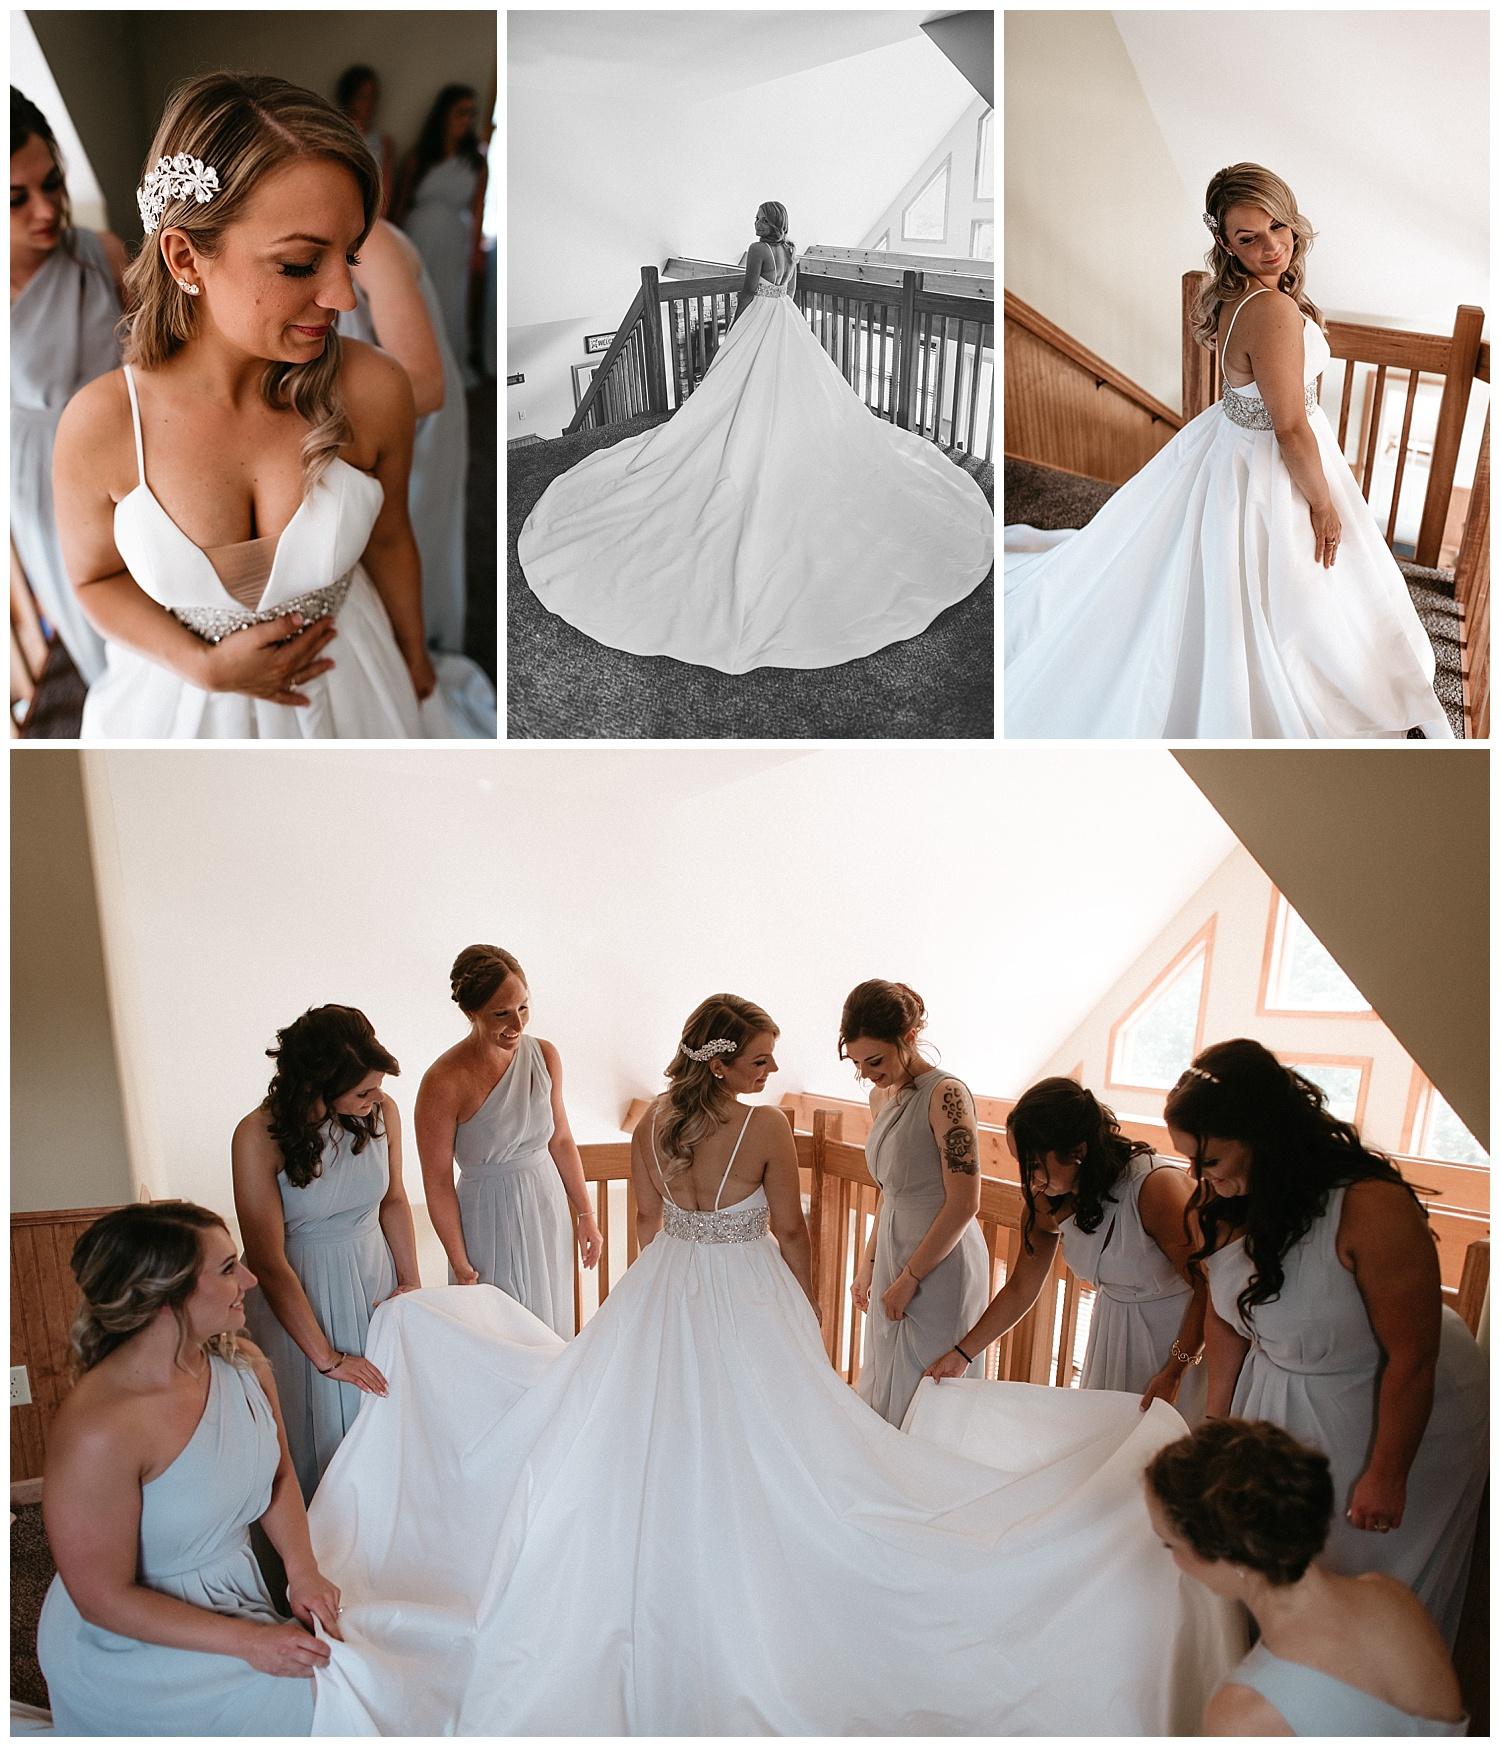 Destination-Wedding-Photographer-in-NEPA-Palmerton-PA_0004.jpg